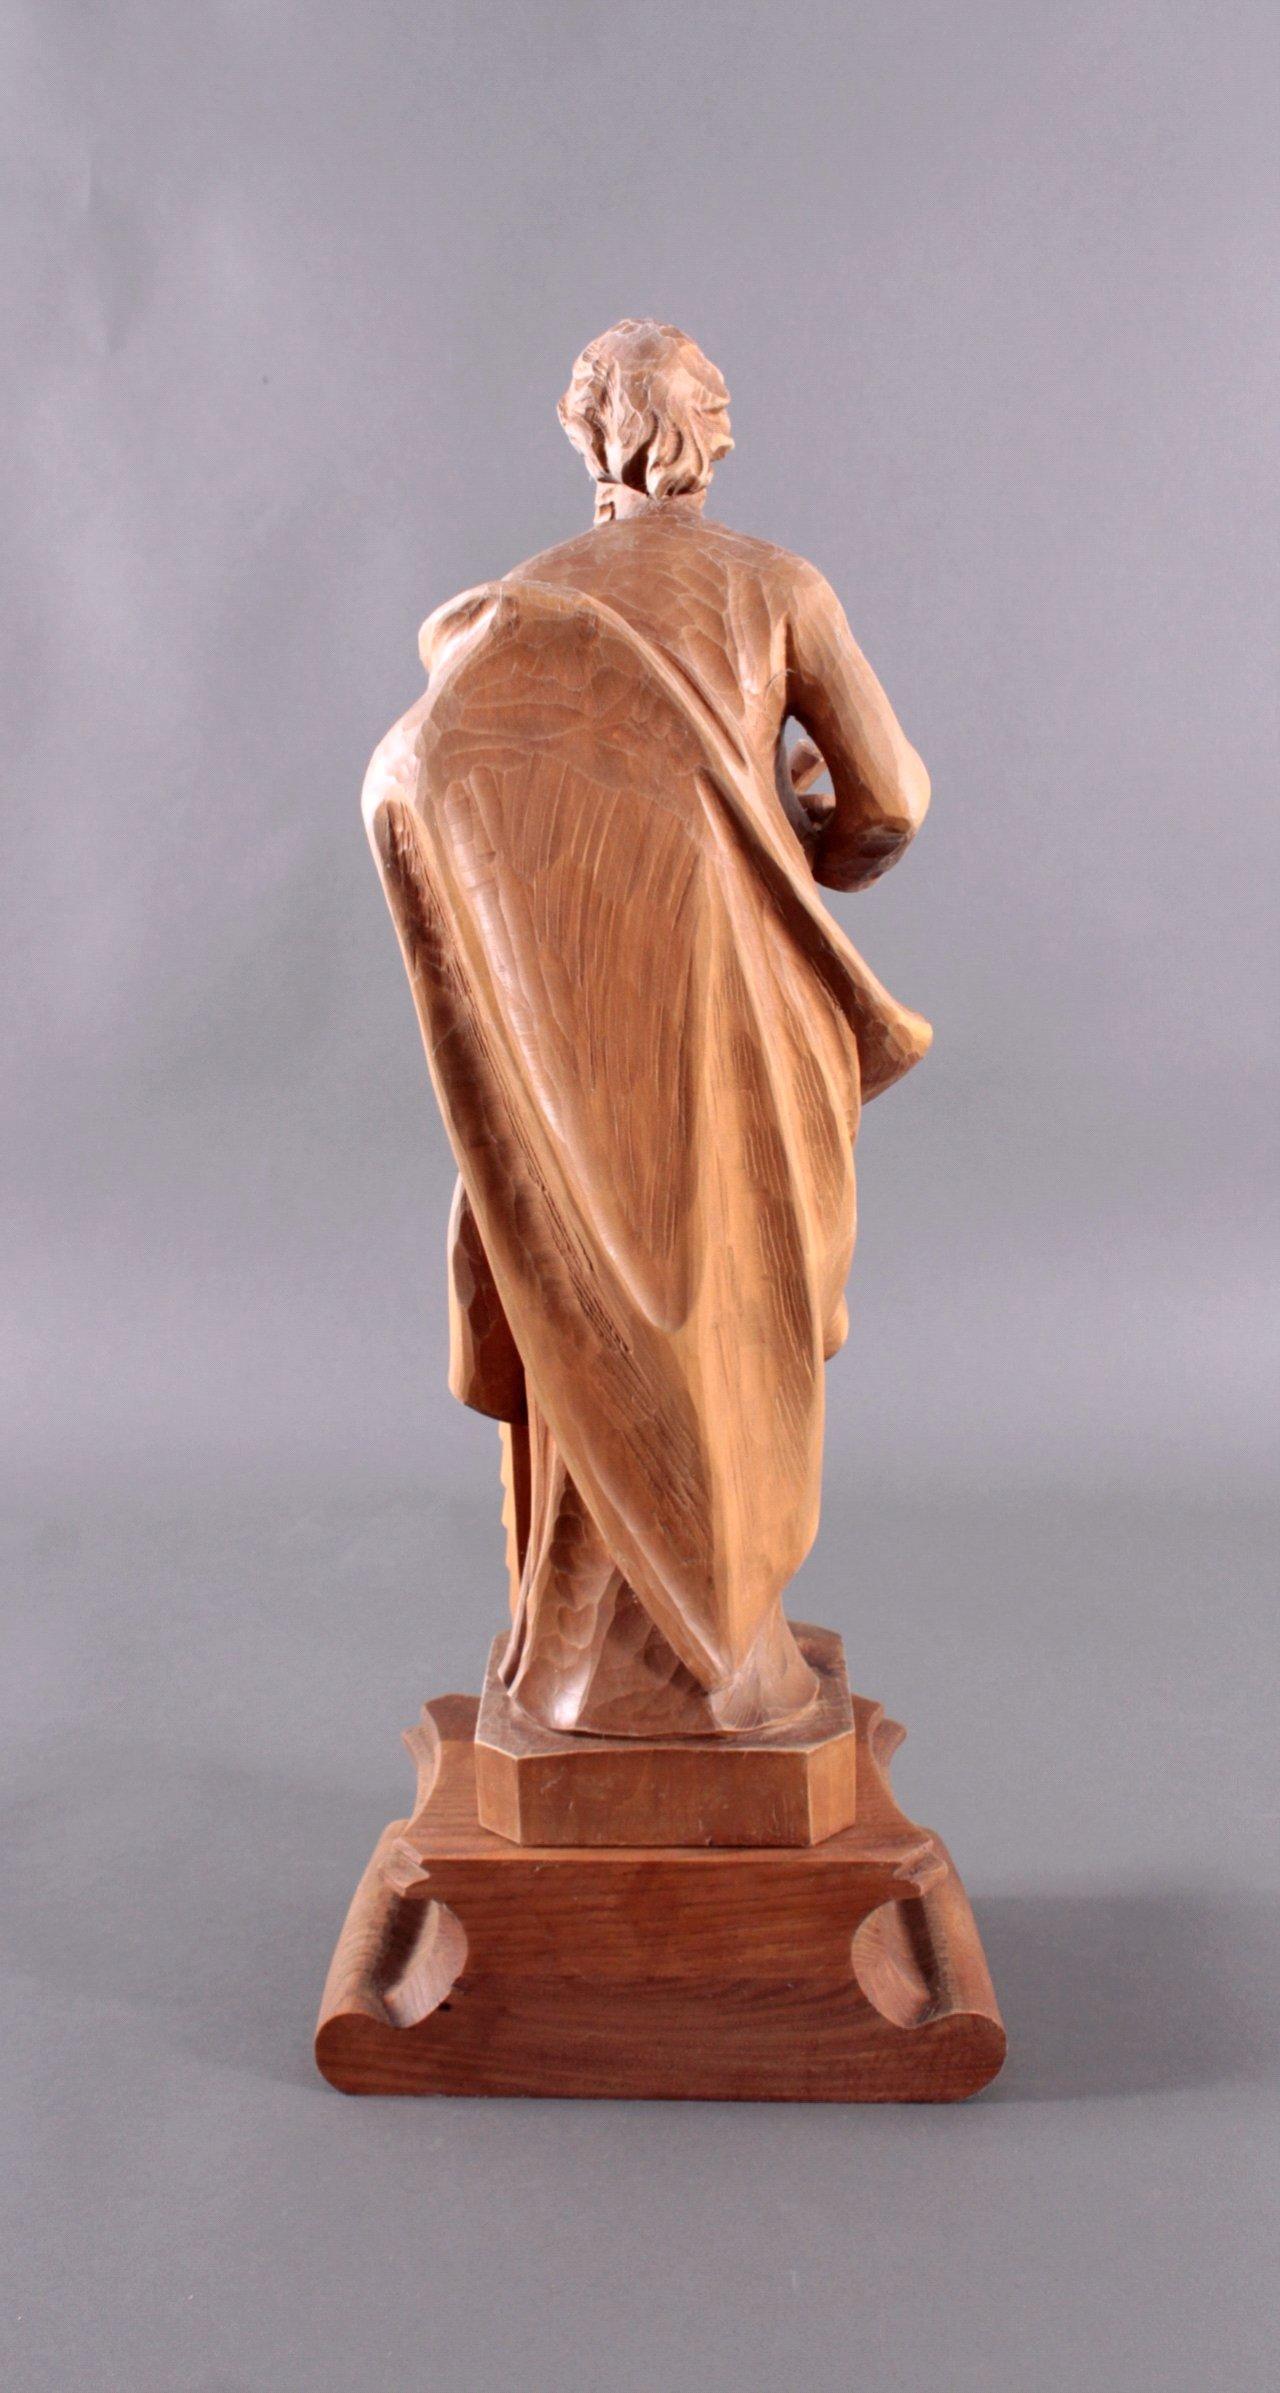 Südtiroler Holzschnitzerei, Der heilige Josef-1